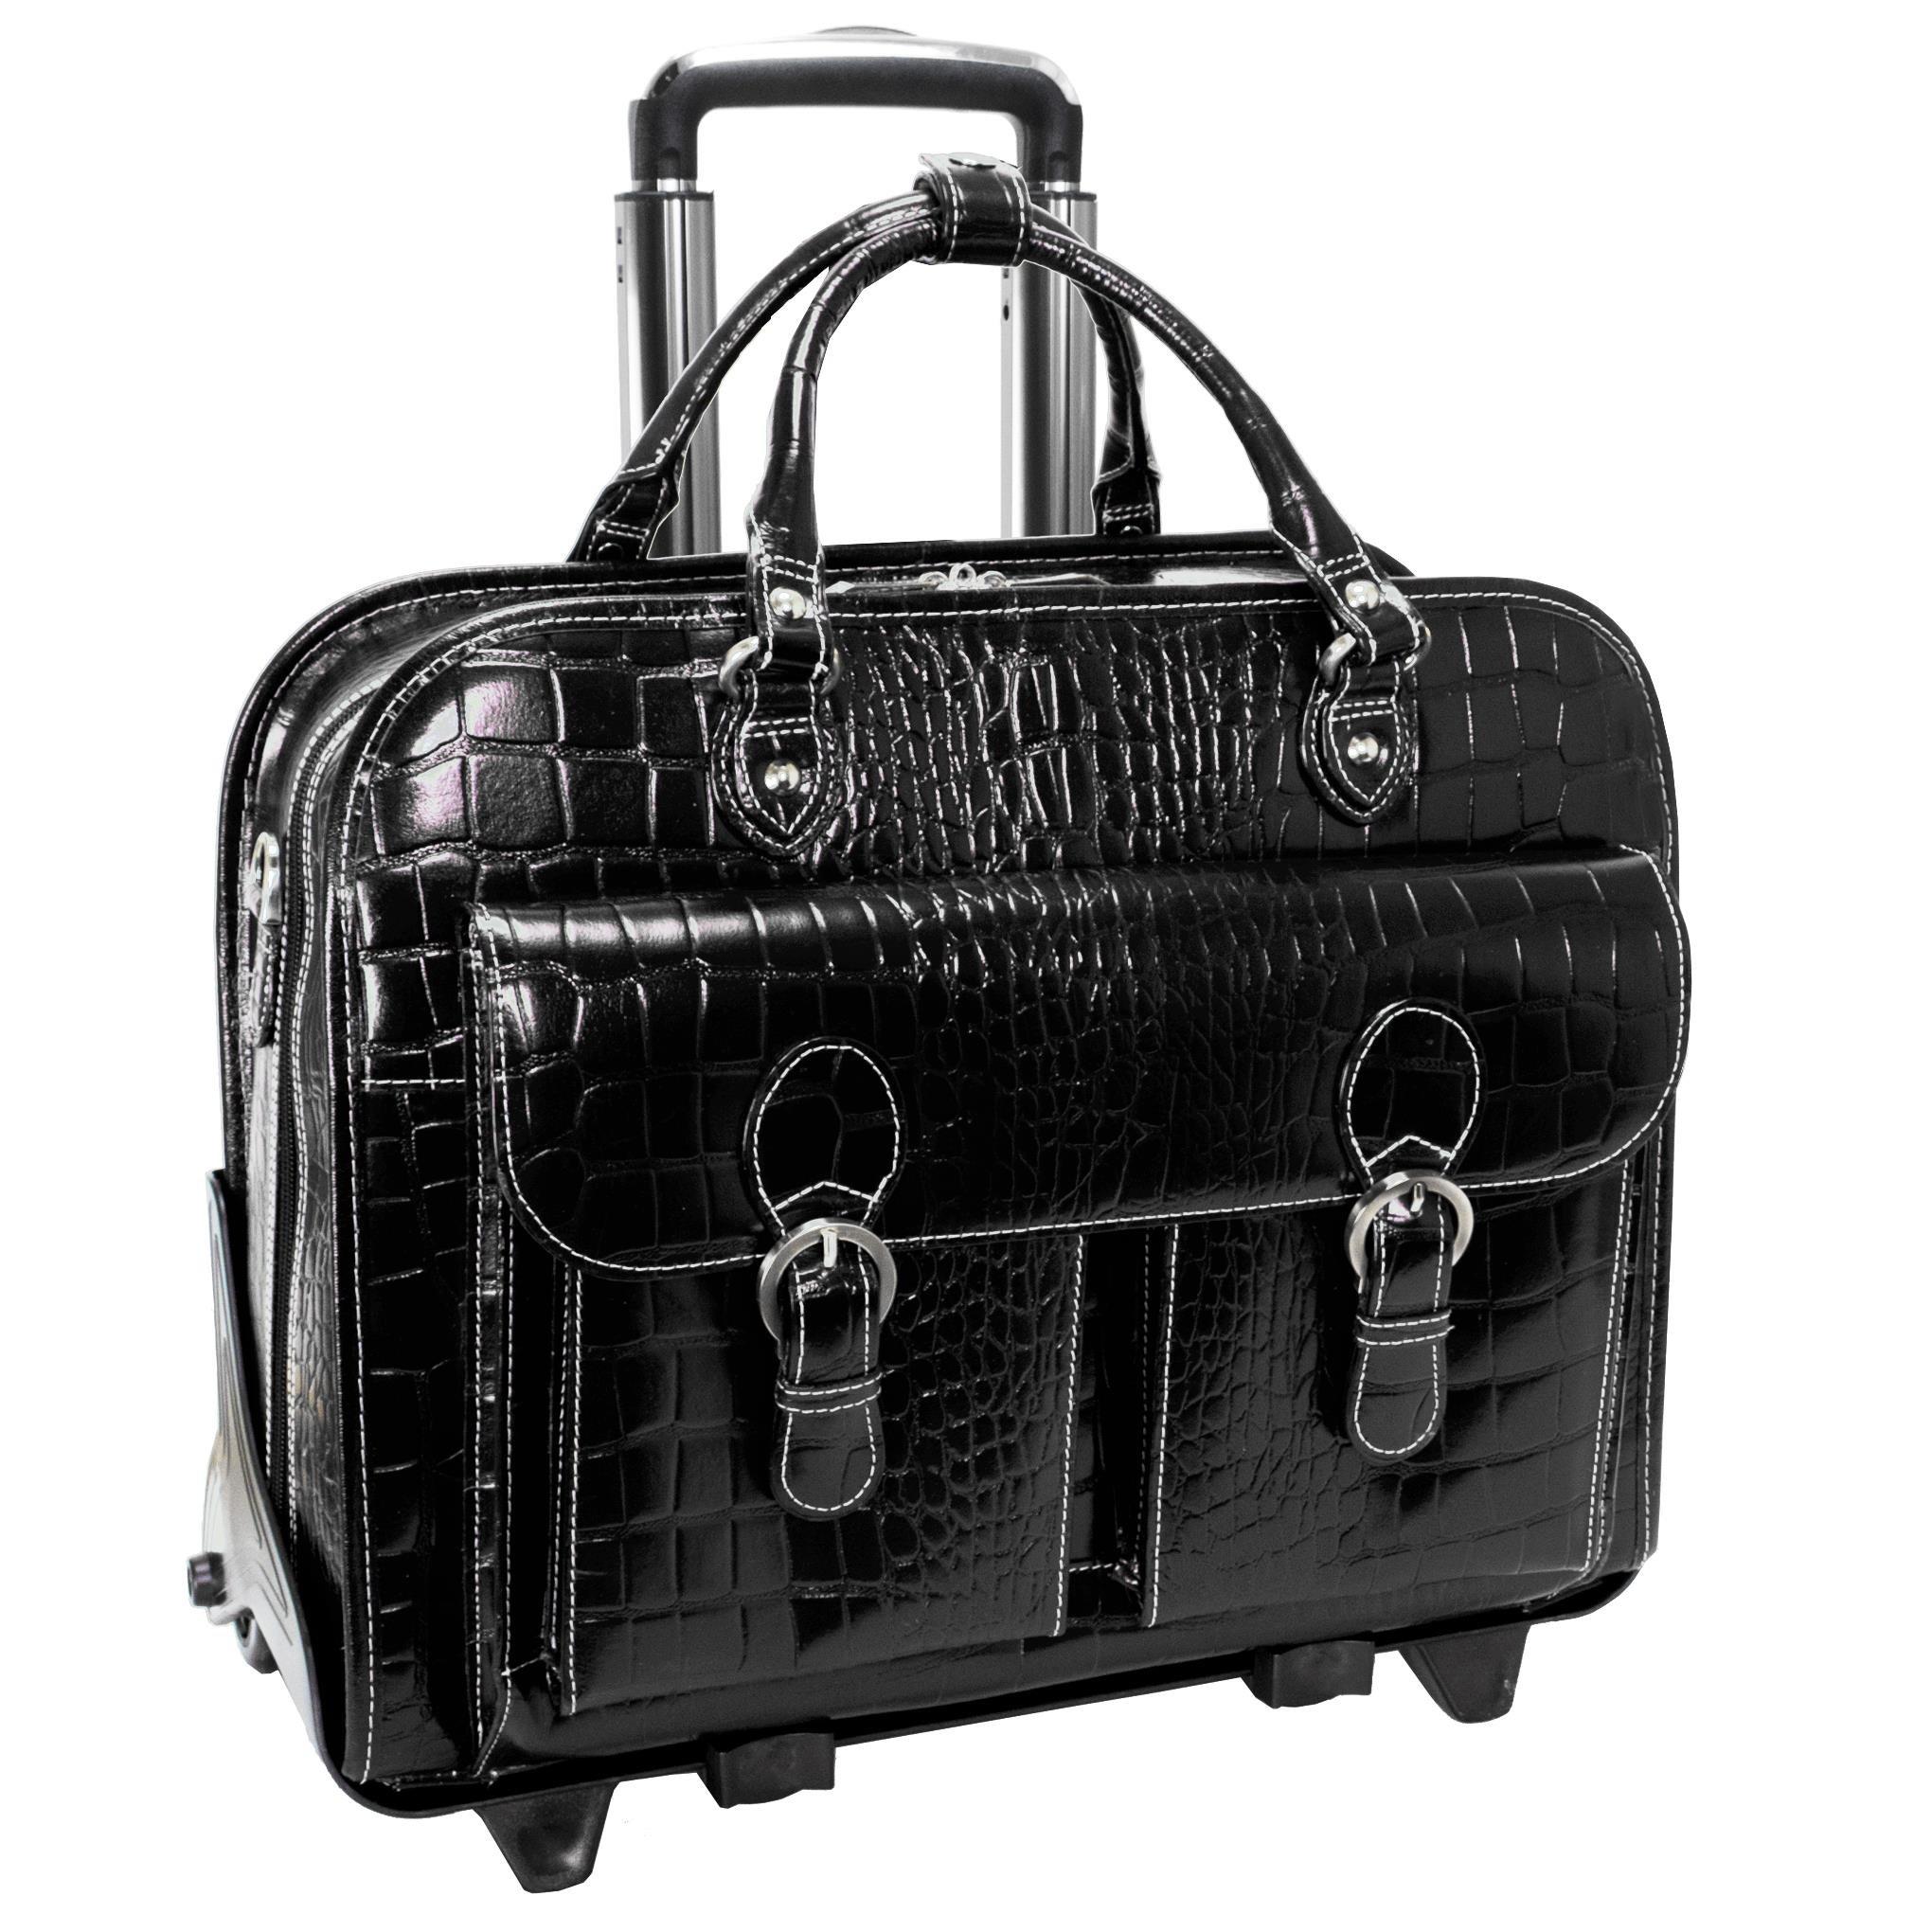 Siamod SAN MARTINO 35305 Black Leather Ladies' Detachable-Wheeled Laptop Case